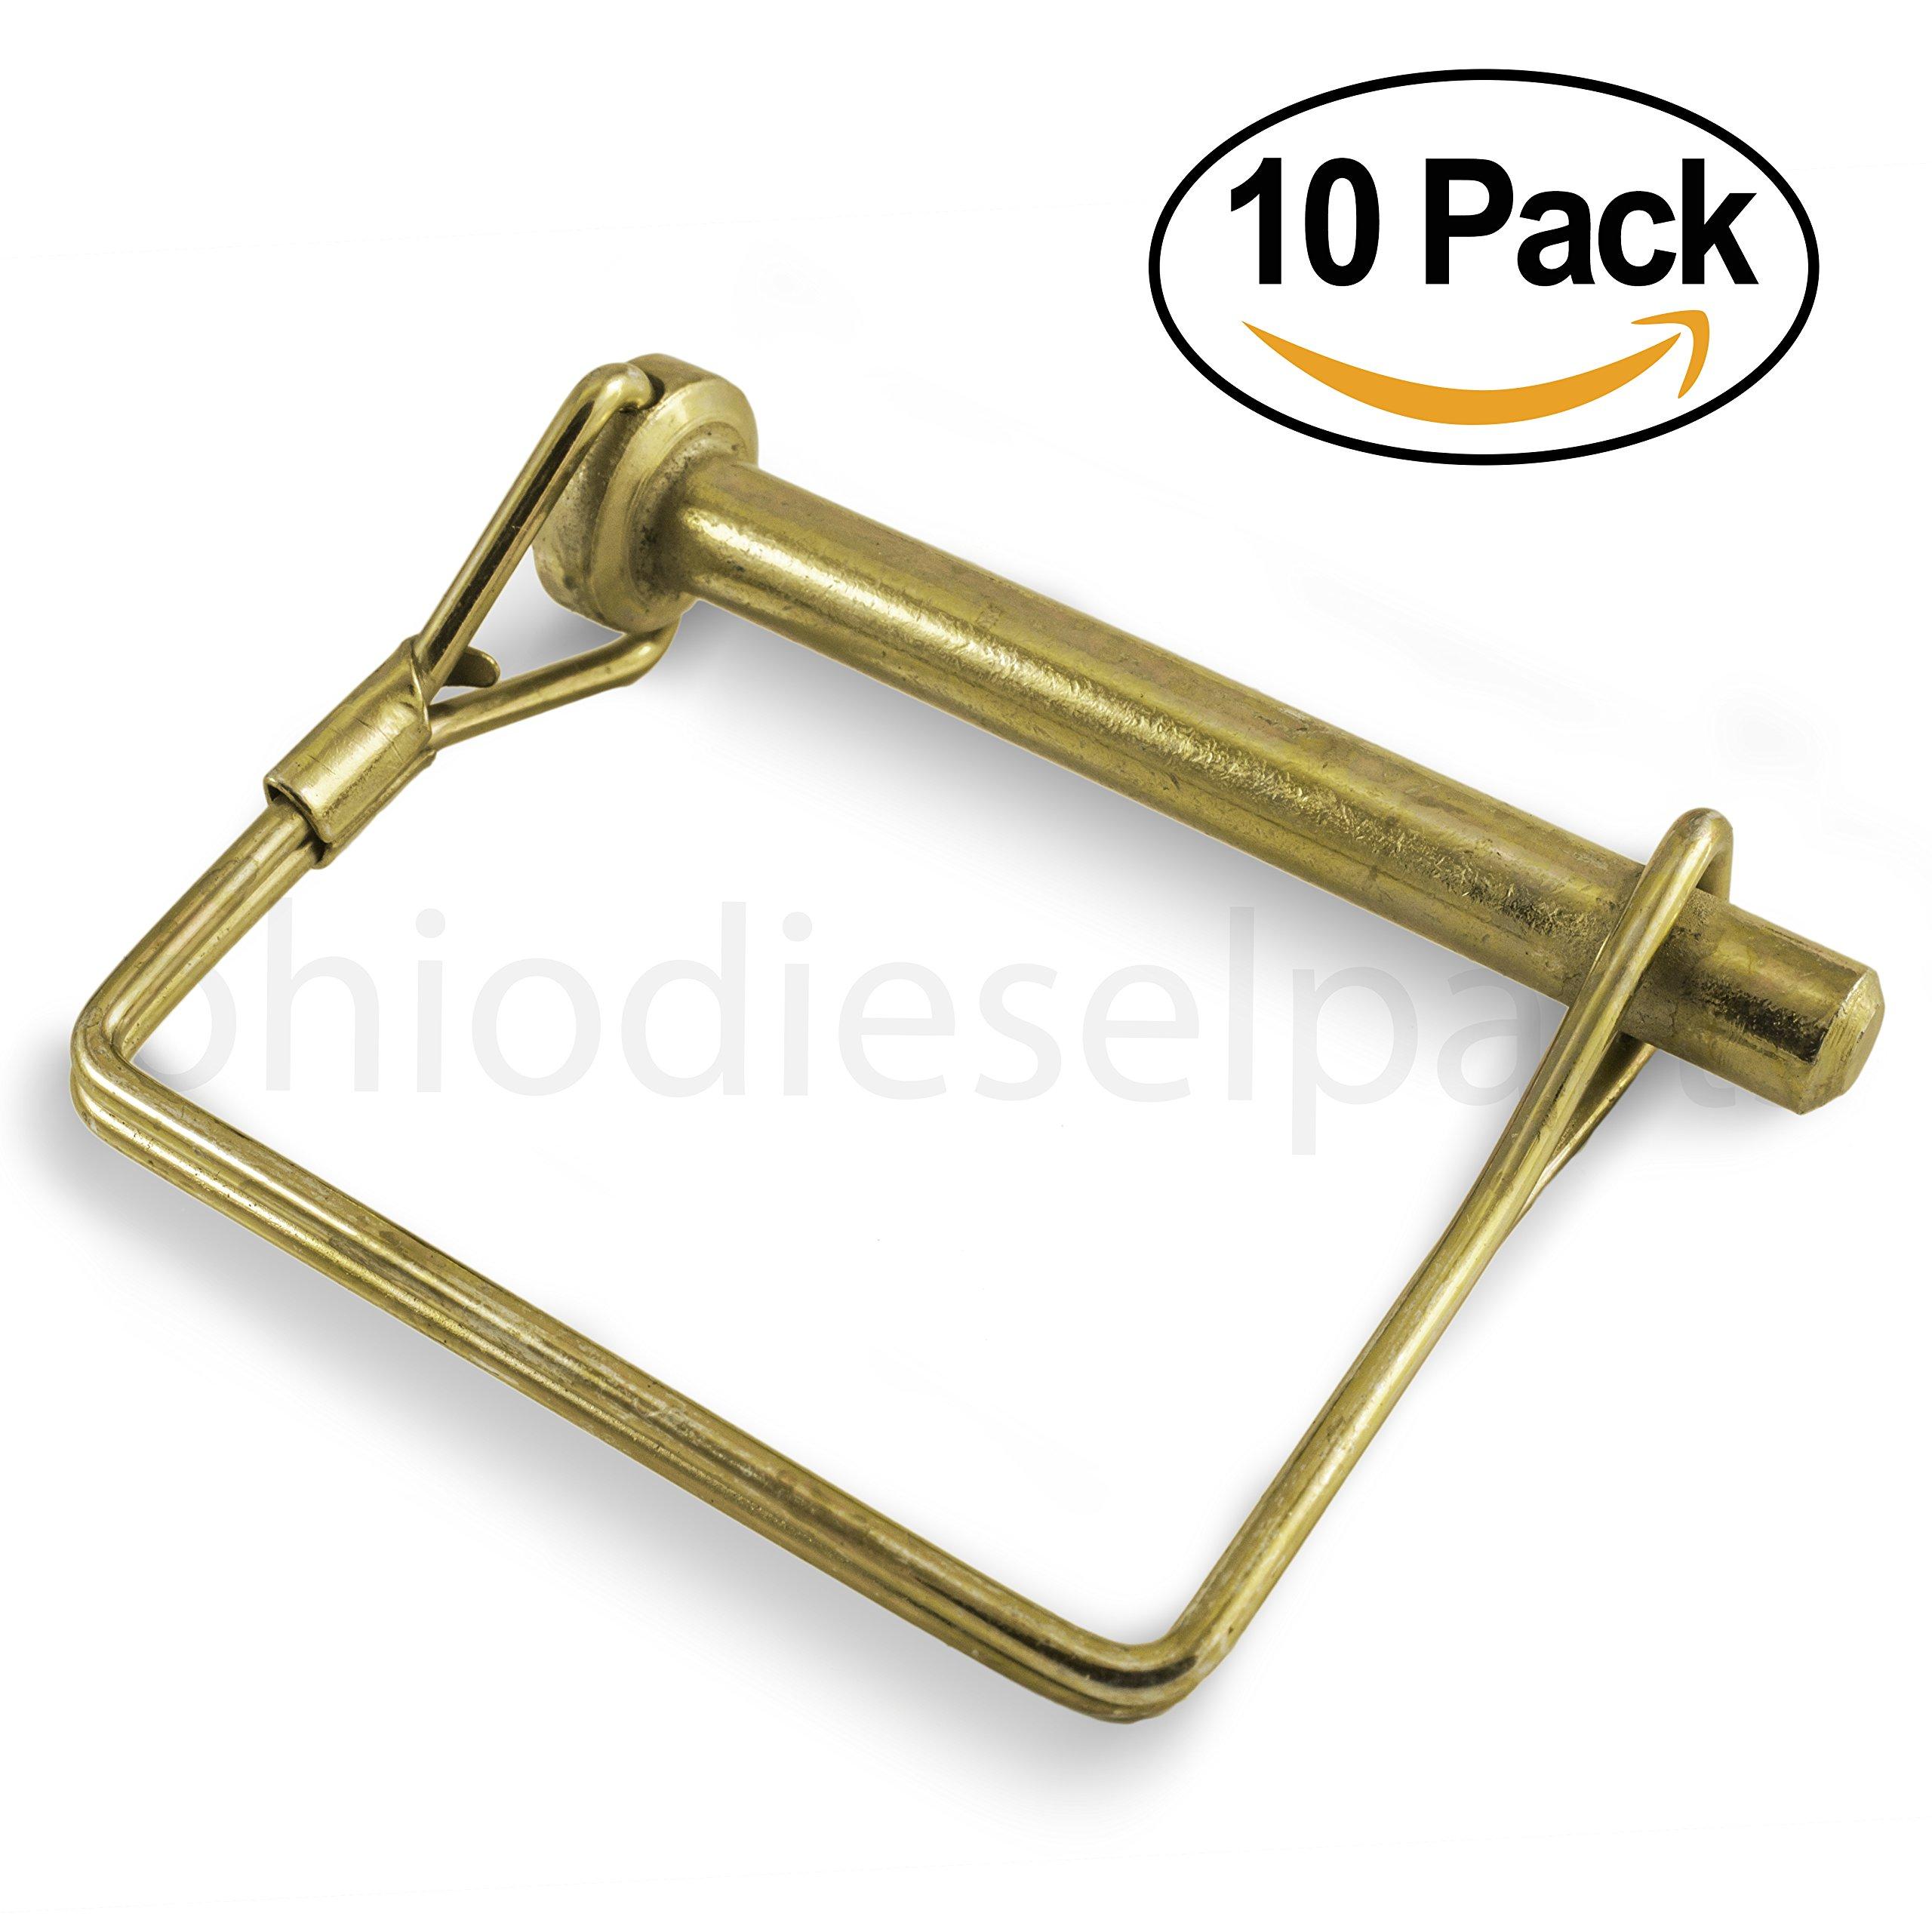 PTO Square Shaft Locking Pin 5/16'' x 2-1/4'' ( PACK of 10)